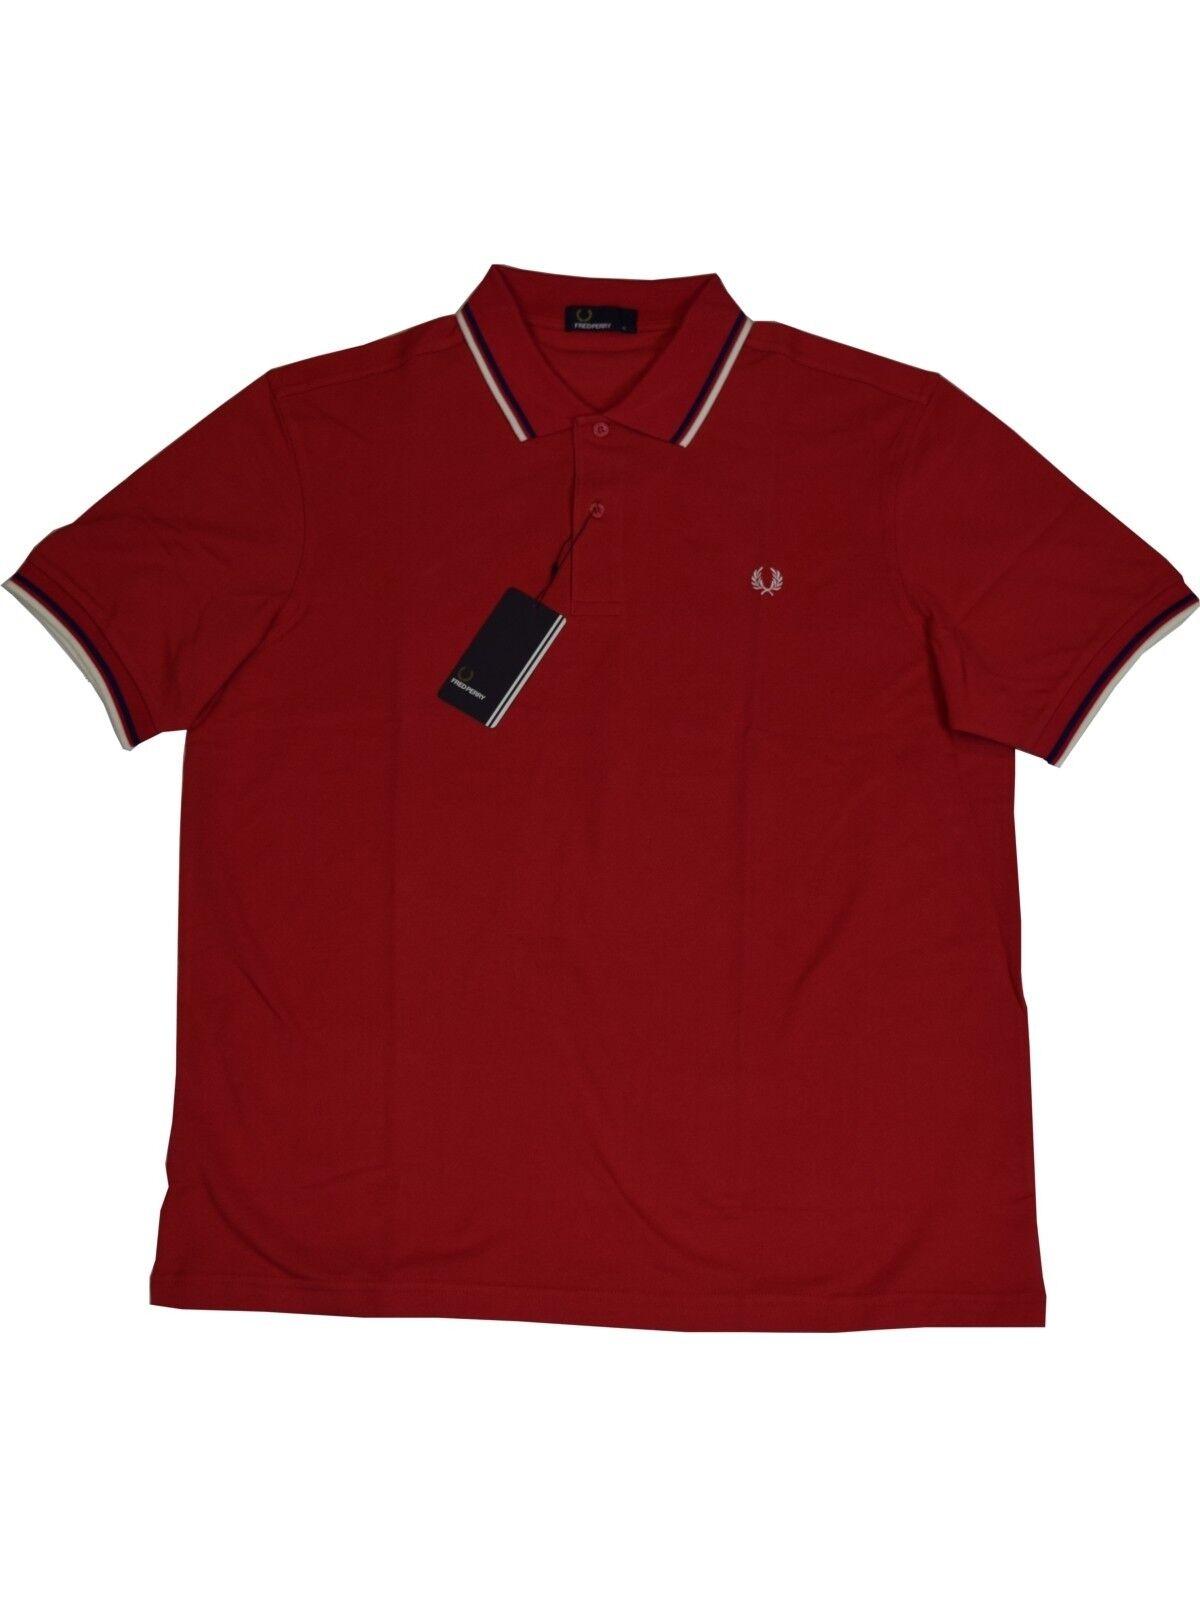 FROT Perry Polo - Shirt M1200 B08 Rot / Blau / Weiß  5377